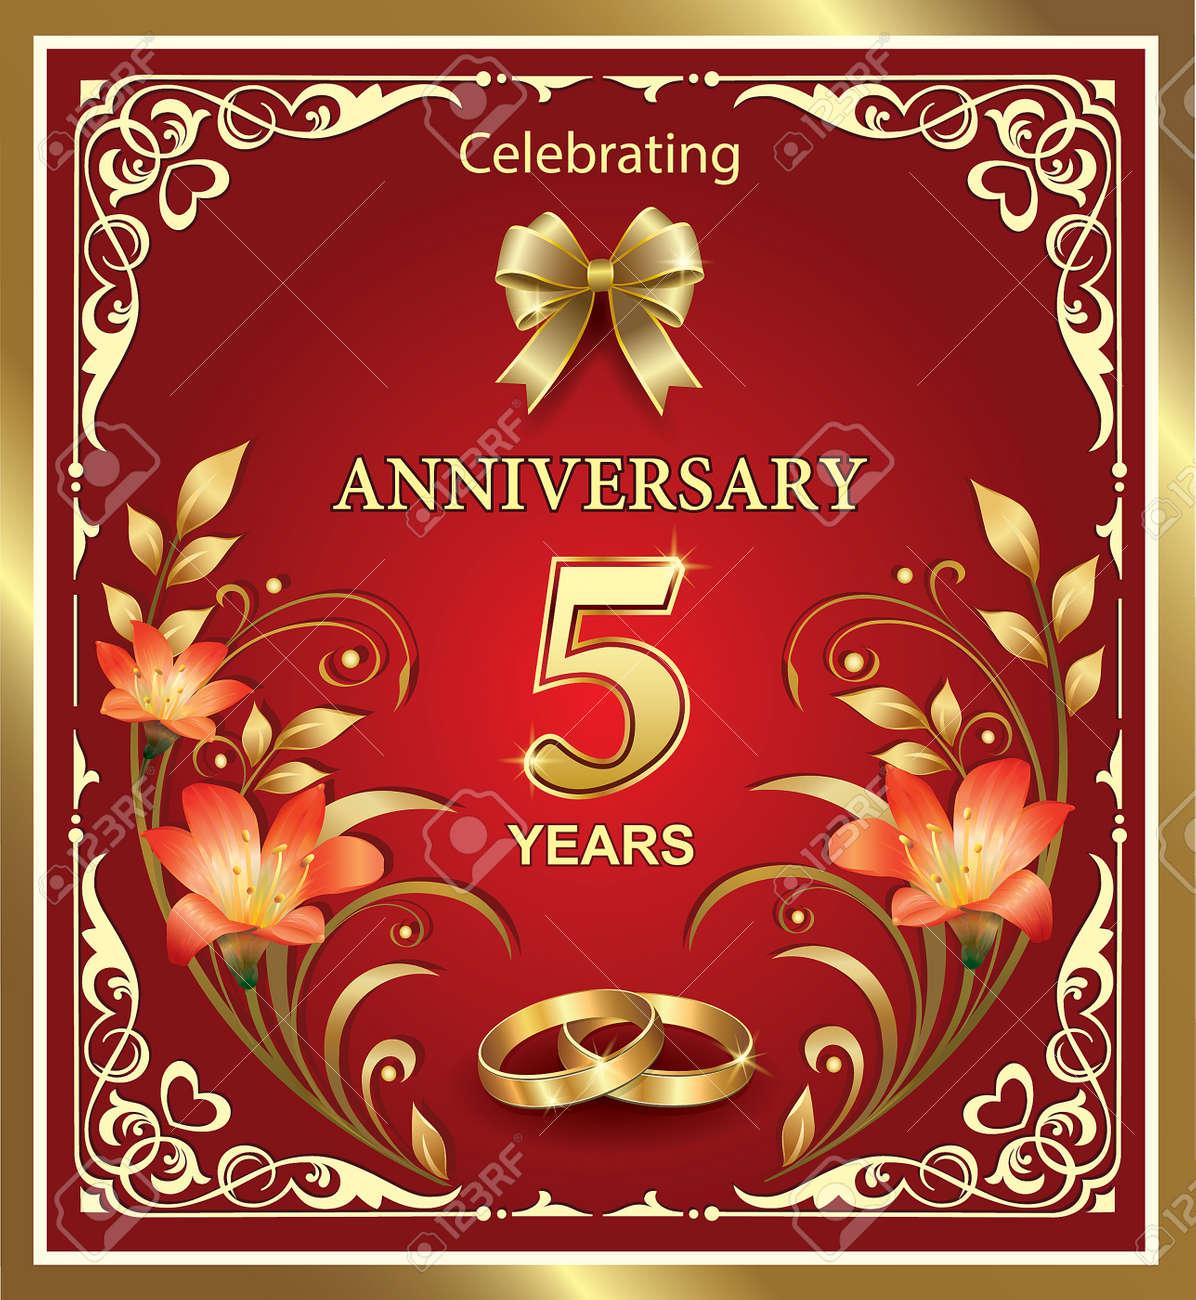 Emejing 5 yr wedding anniversary pictures styles ideas 2018 5 year wedding anniversary on a red background royalty free biocorpaavc Gallery